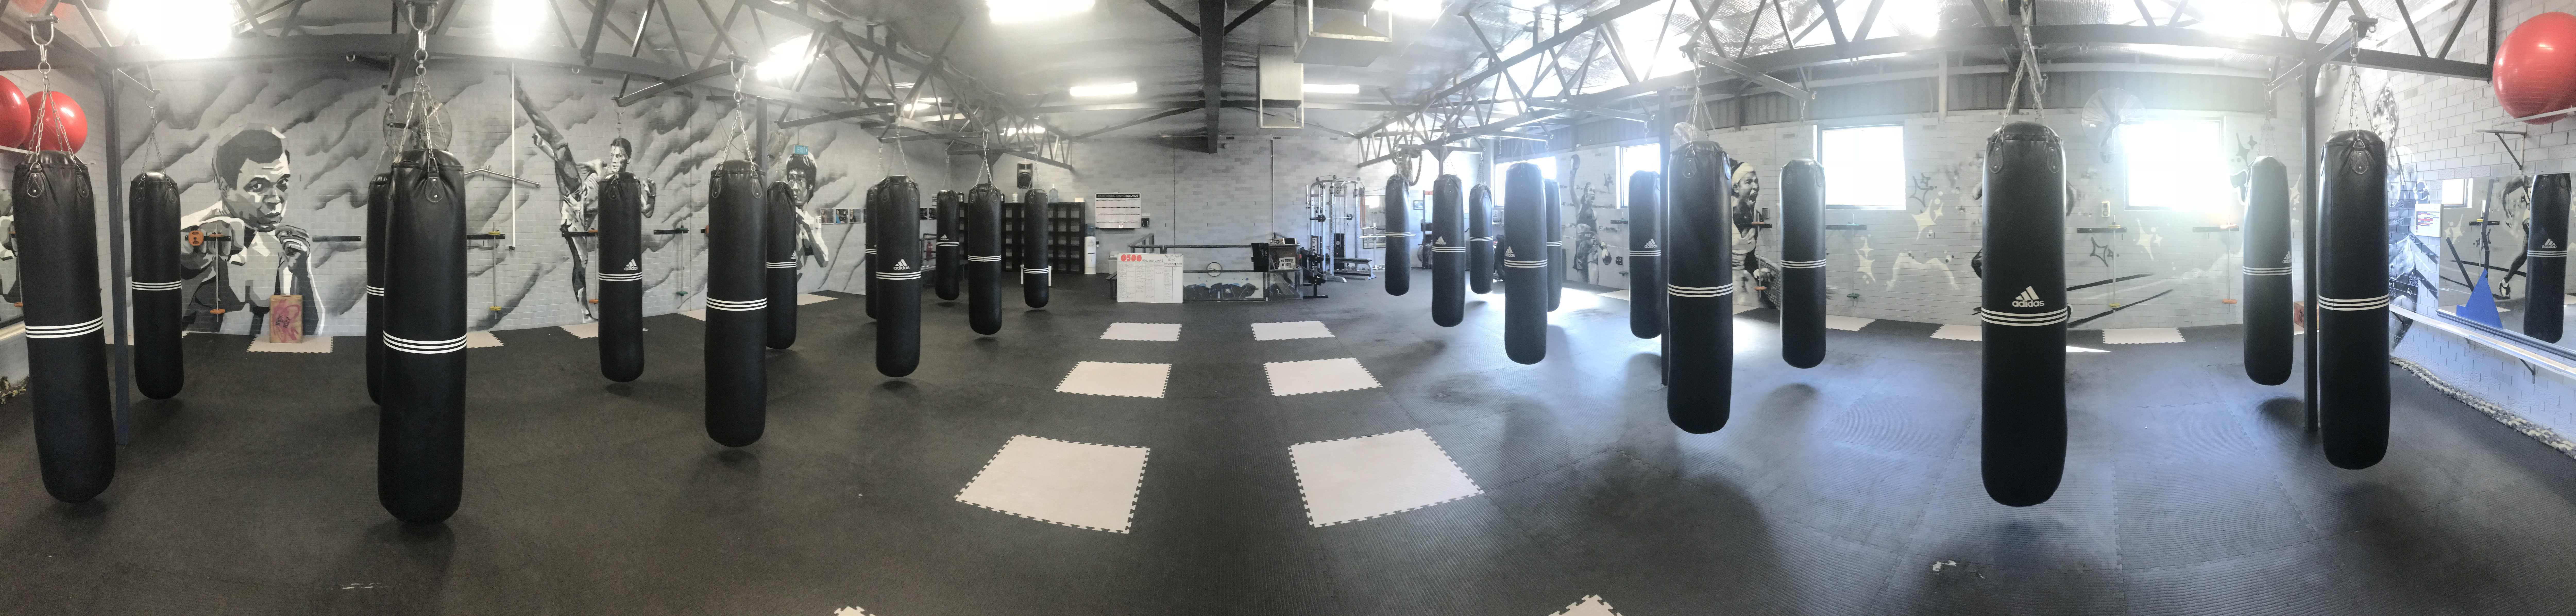 Gym panoramic. Kickboxing & Circuits